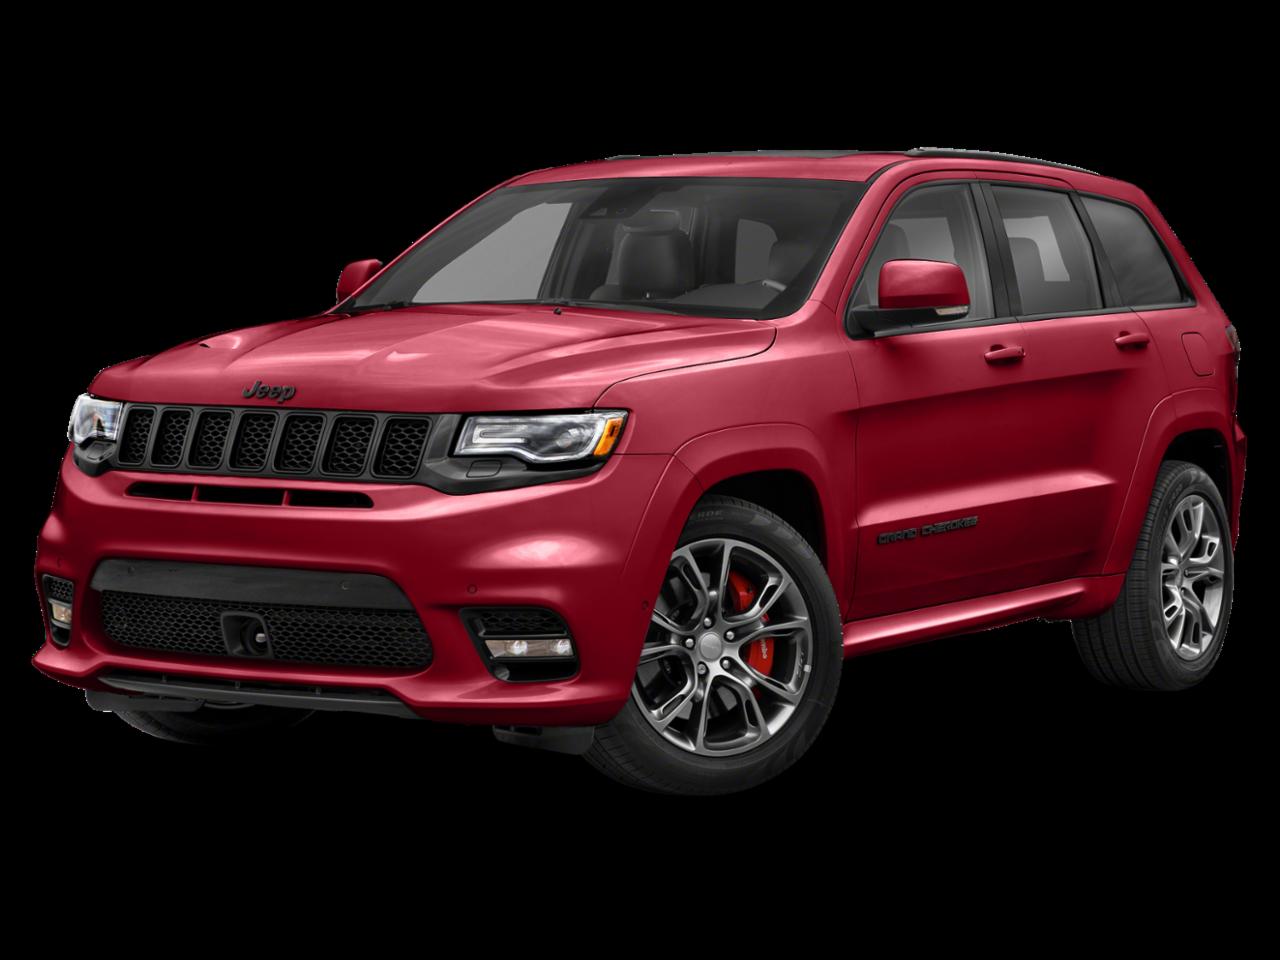 Jeep 2020 Grand Cherokee SRT